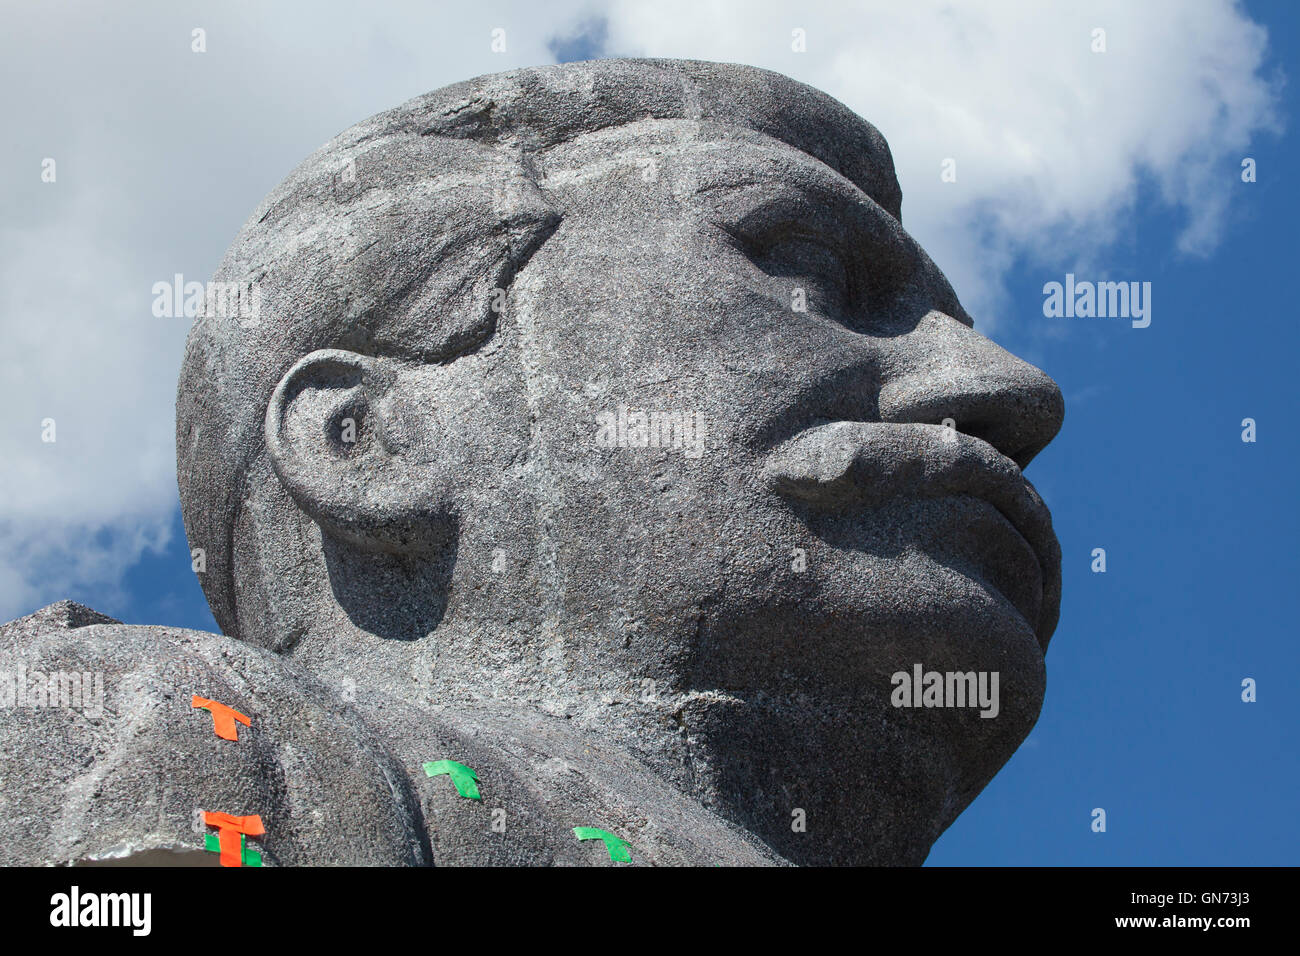 Huge head of Soviet dictator Joseph Stalin rising over Letna Park in Prague, Czech Republic, during the Czech Television Stock Photo